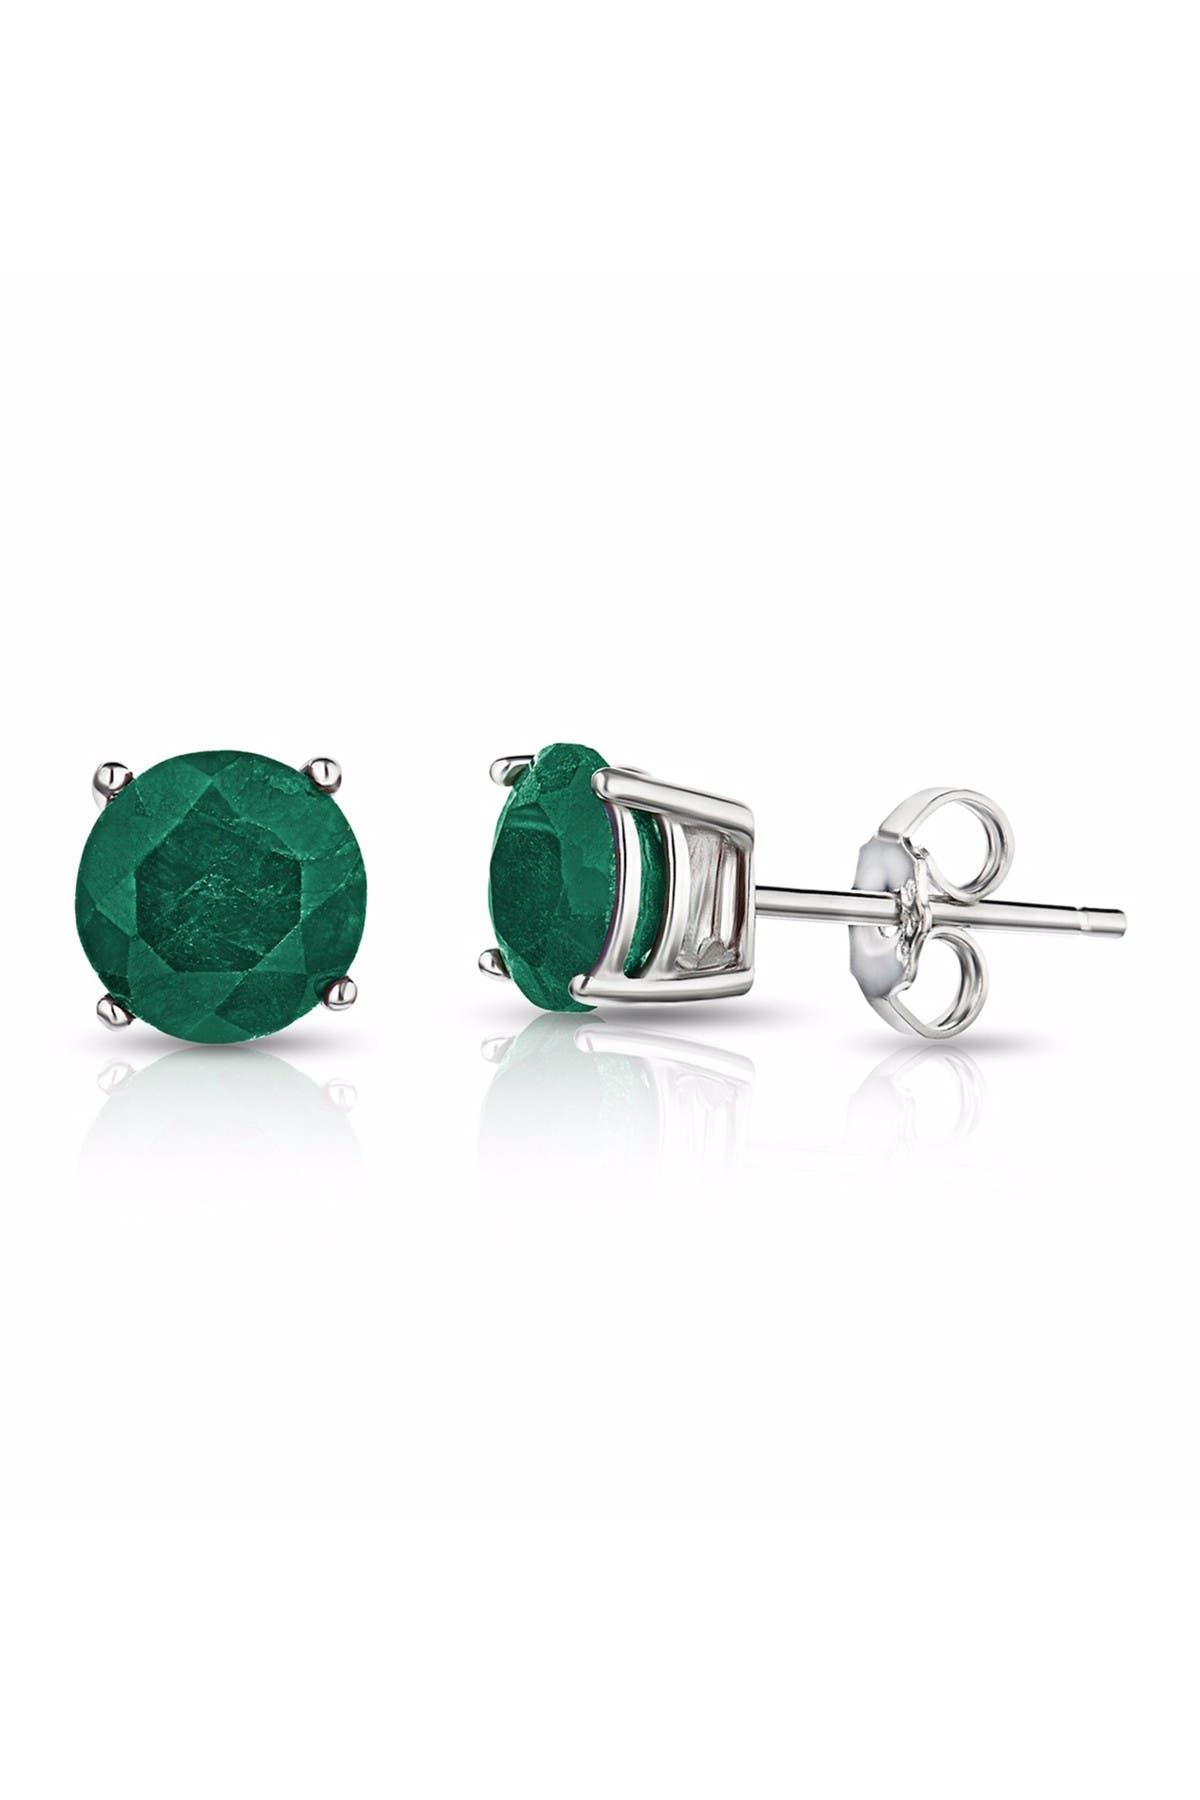 Image of Best Silver Inc. Sterling Silver 6mm Emerald CZ Stud Earrings